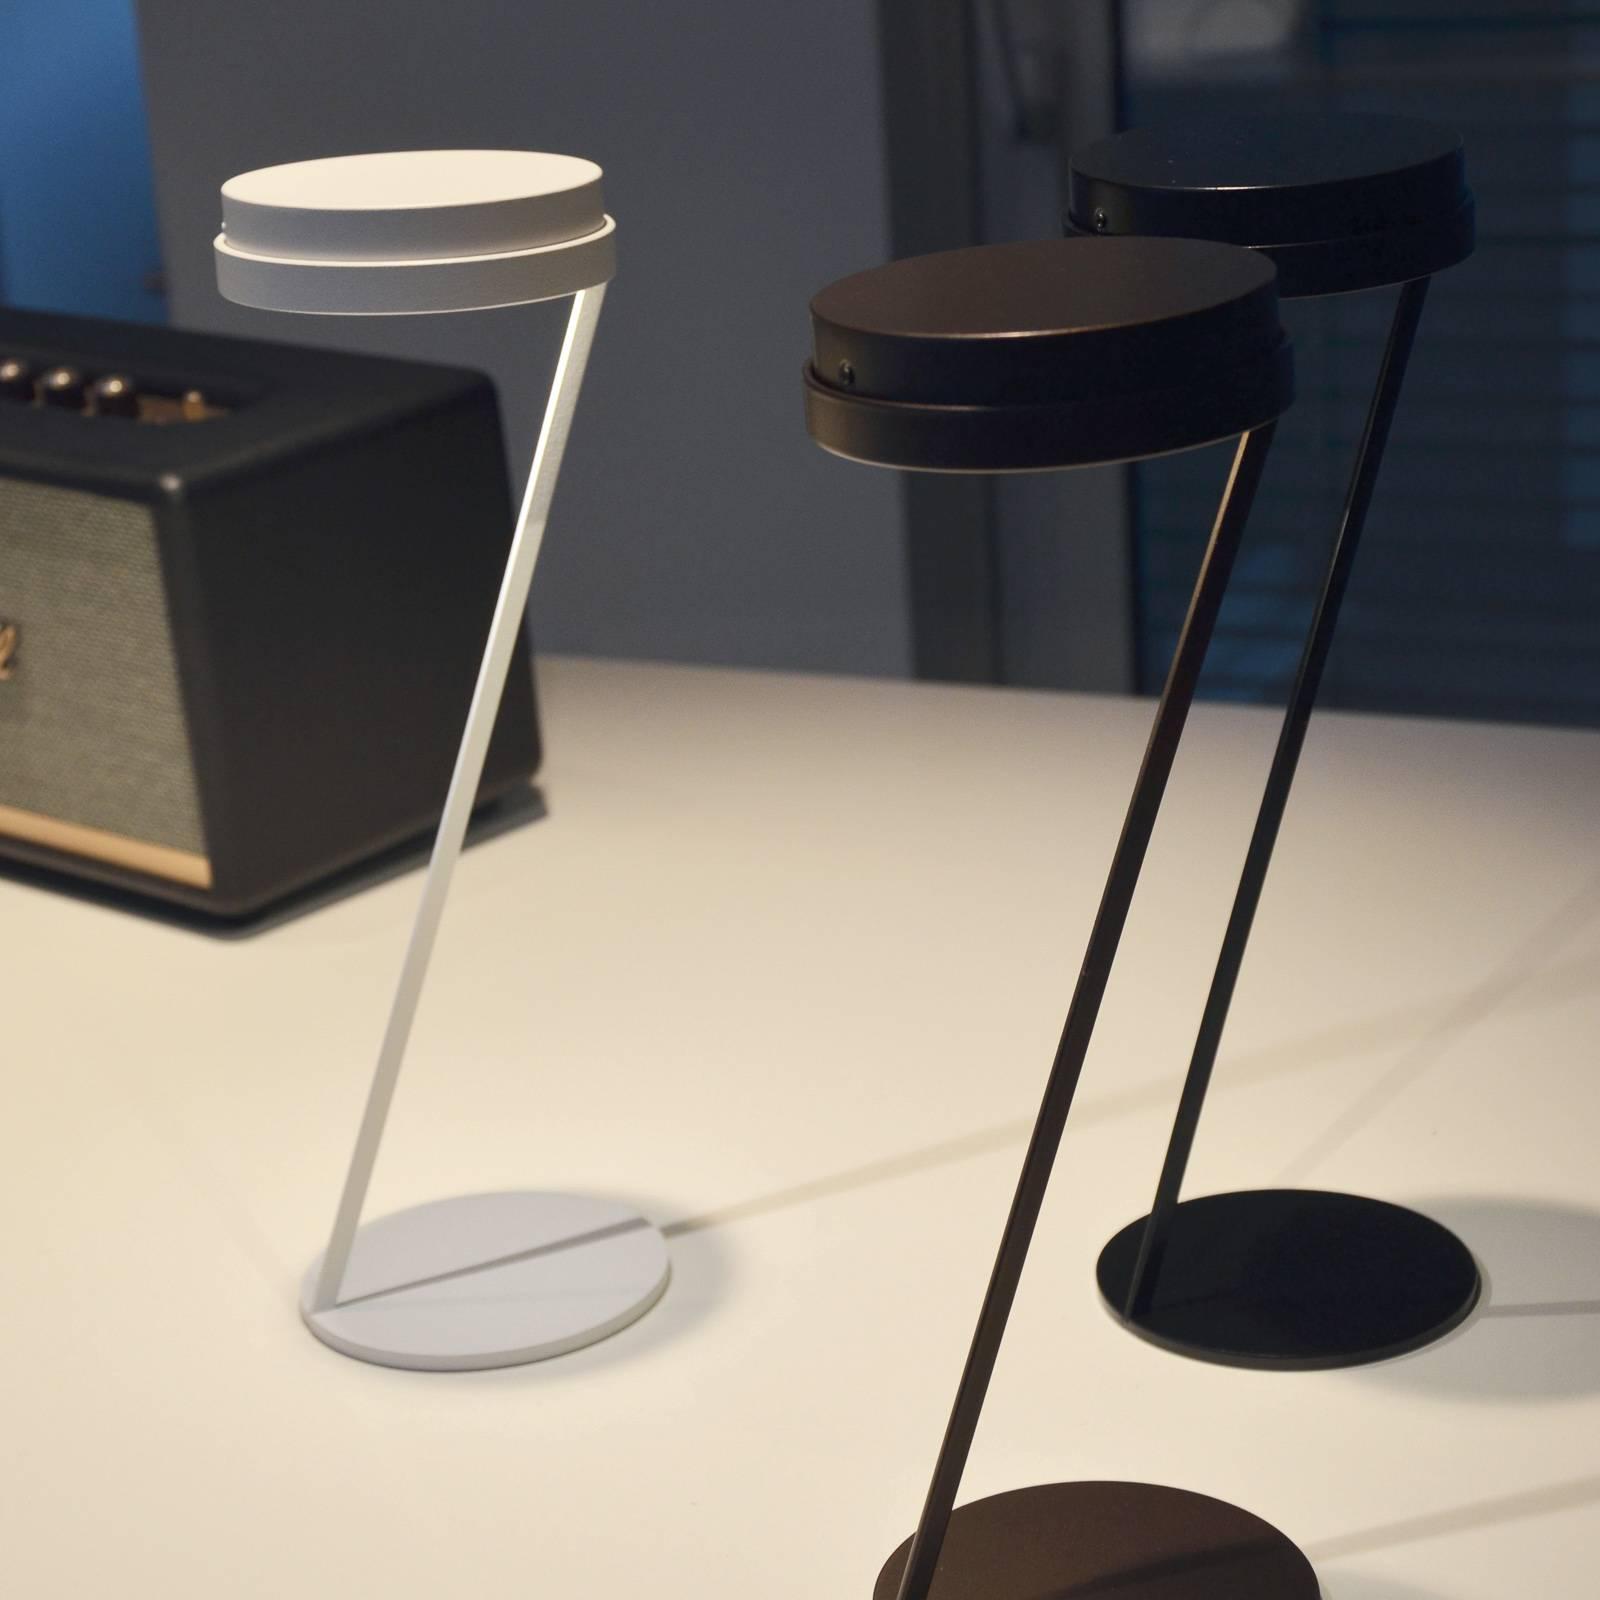 Knikerboker Zeta LED-pöytälamppu, tunnistin, musta